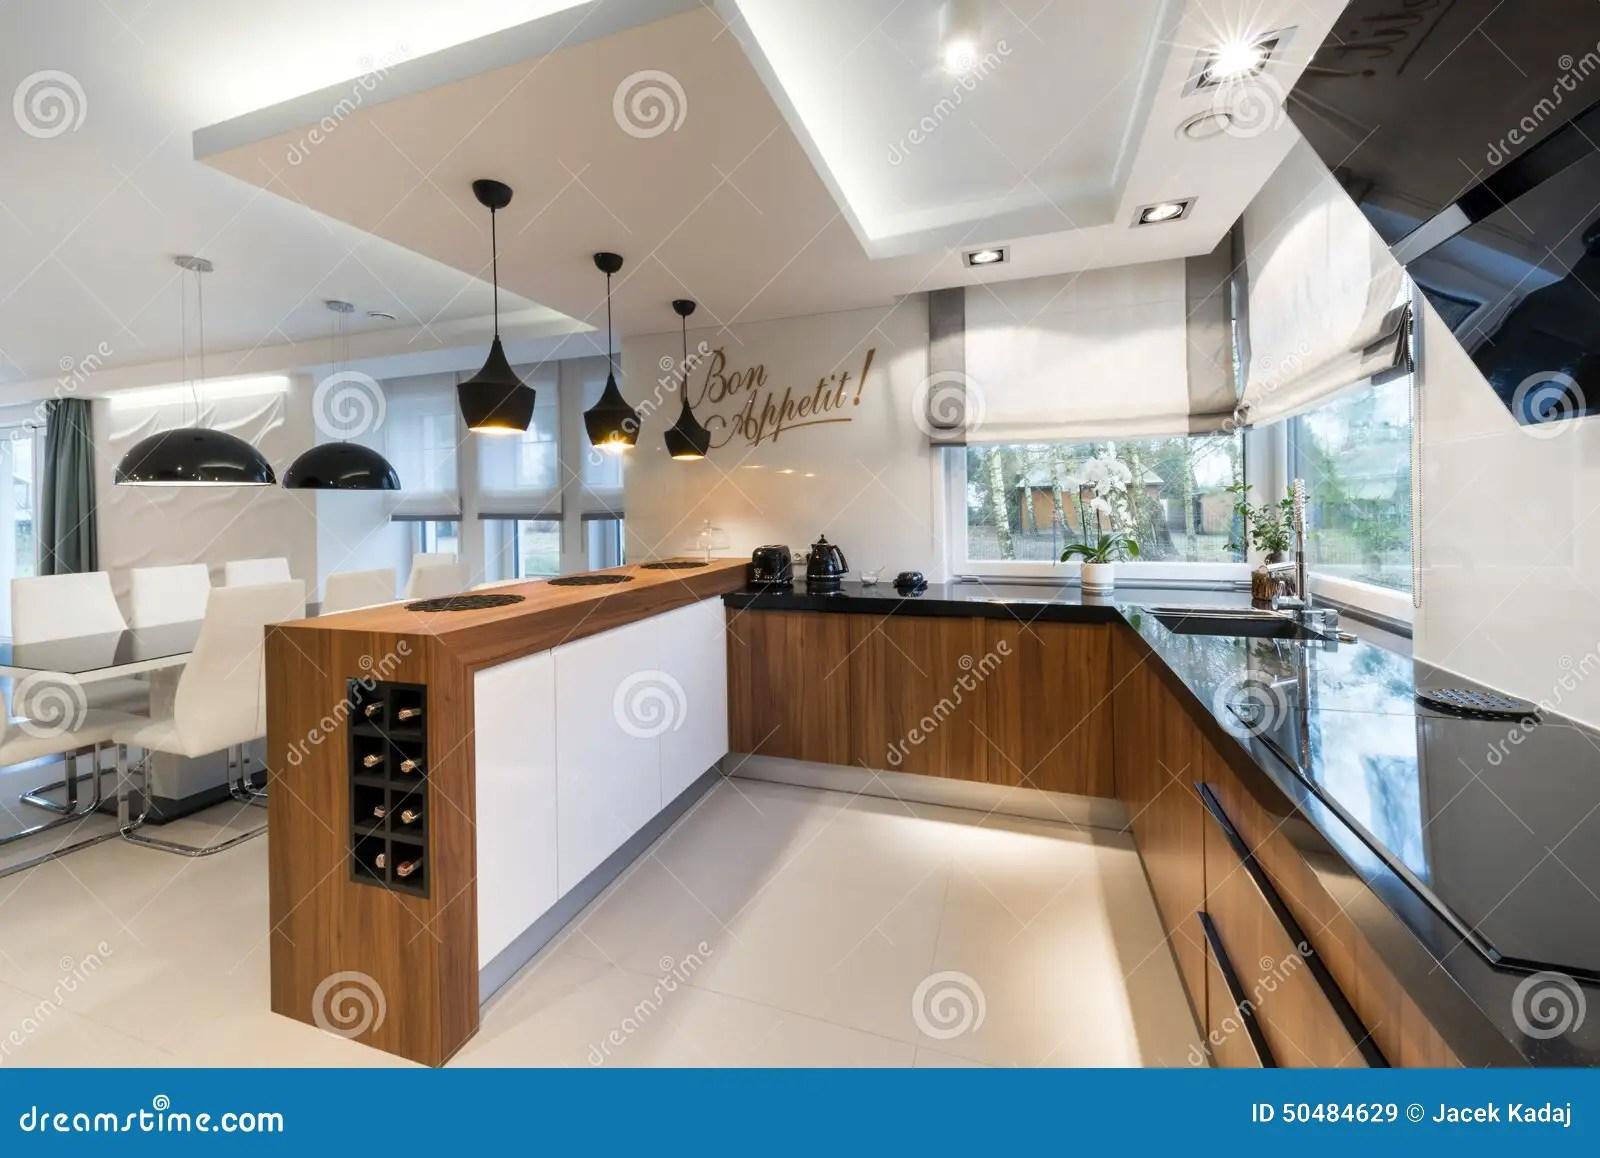 Modern Kitchen Interior Design Stock Image Image Of Furniture Mansion 50484629